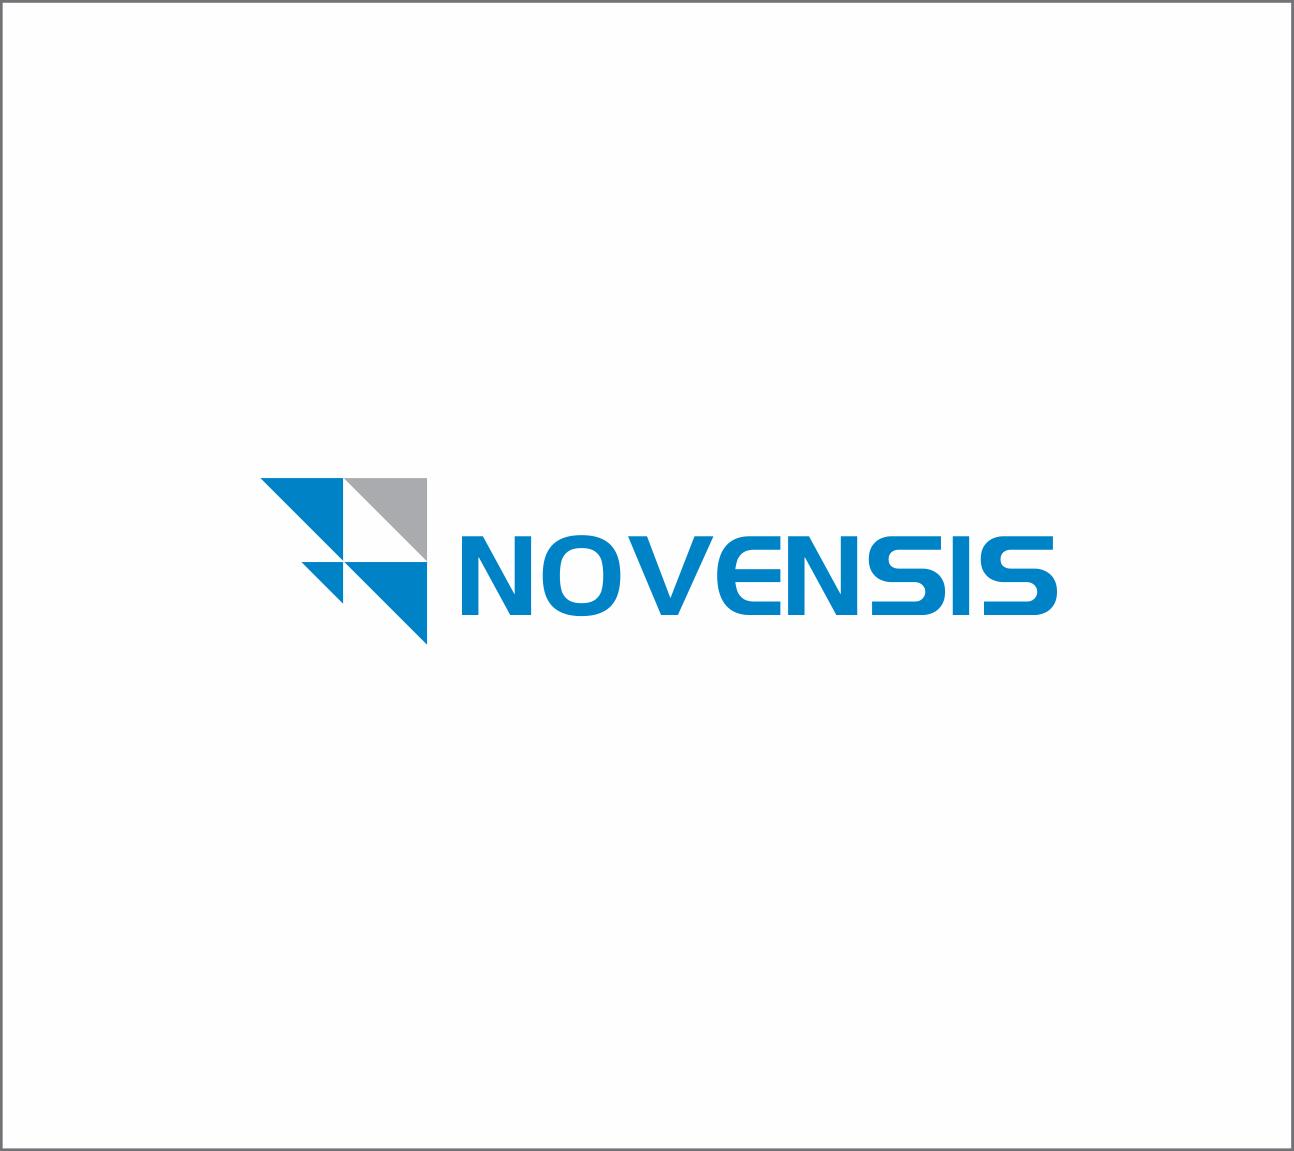 Logo Design by Armada Jamaluddin - Entry No. 116 in the Logo Design Contest Novensis Logo Design.